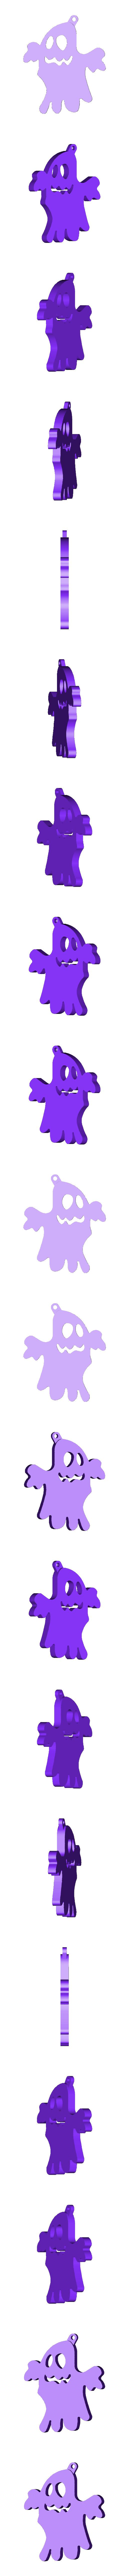 GHOST.stl Download free STL file Ghost ornament • 3D printing object, 3DPrintersaur